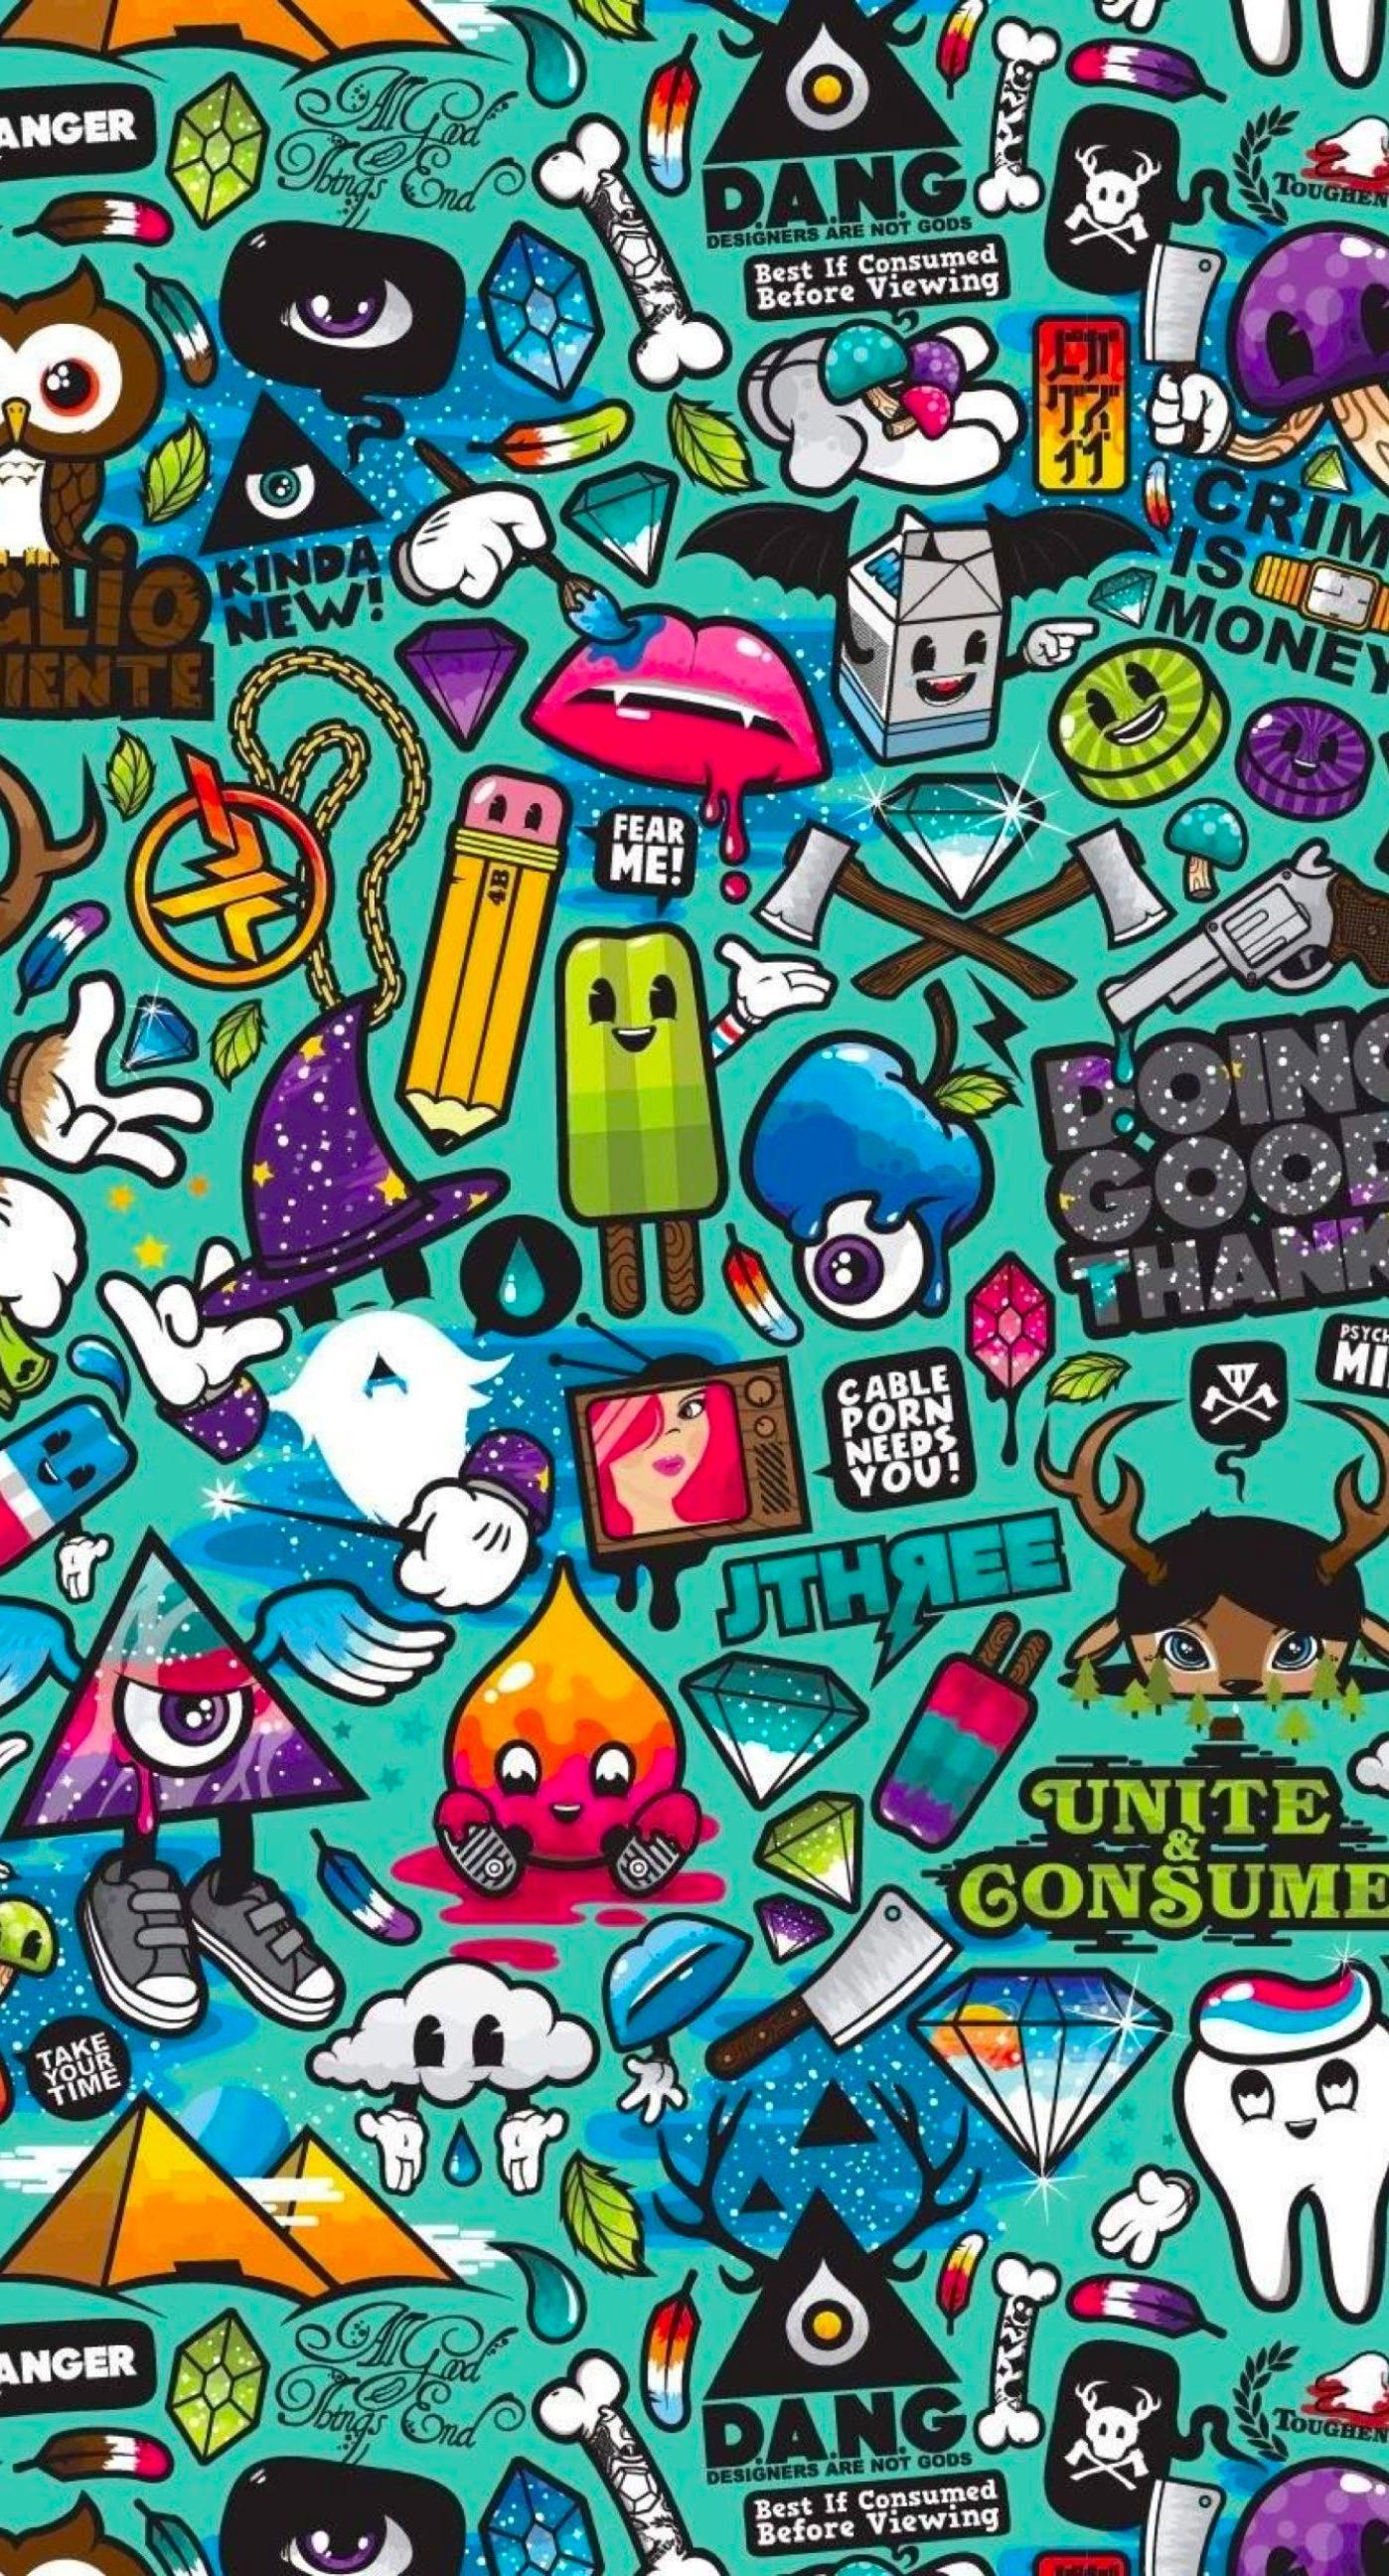 Iphone 6 Plus Wallpaper Iphone Iphone Wallpaper Wallpaper